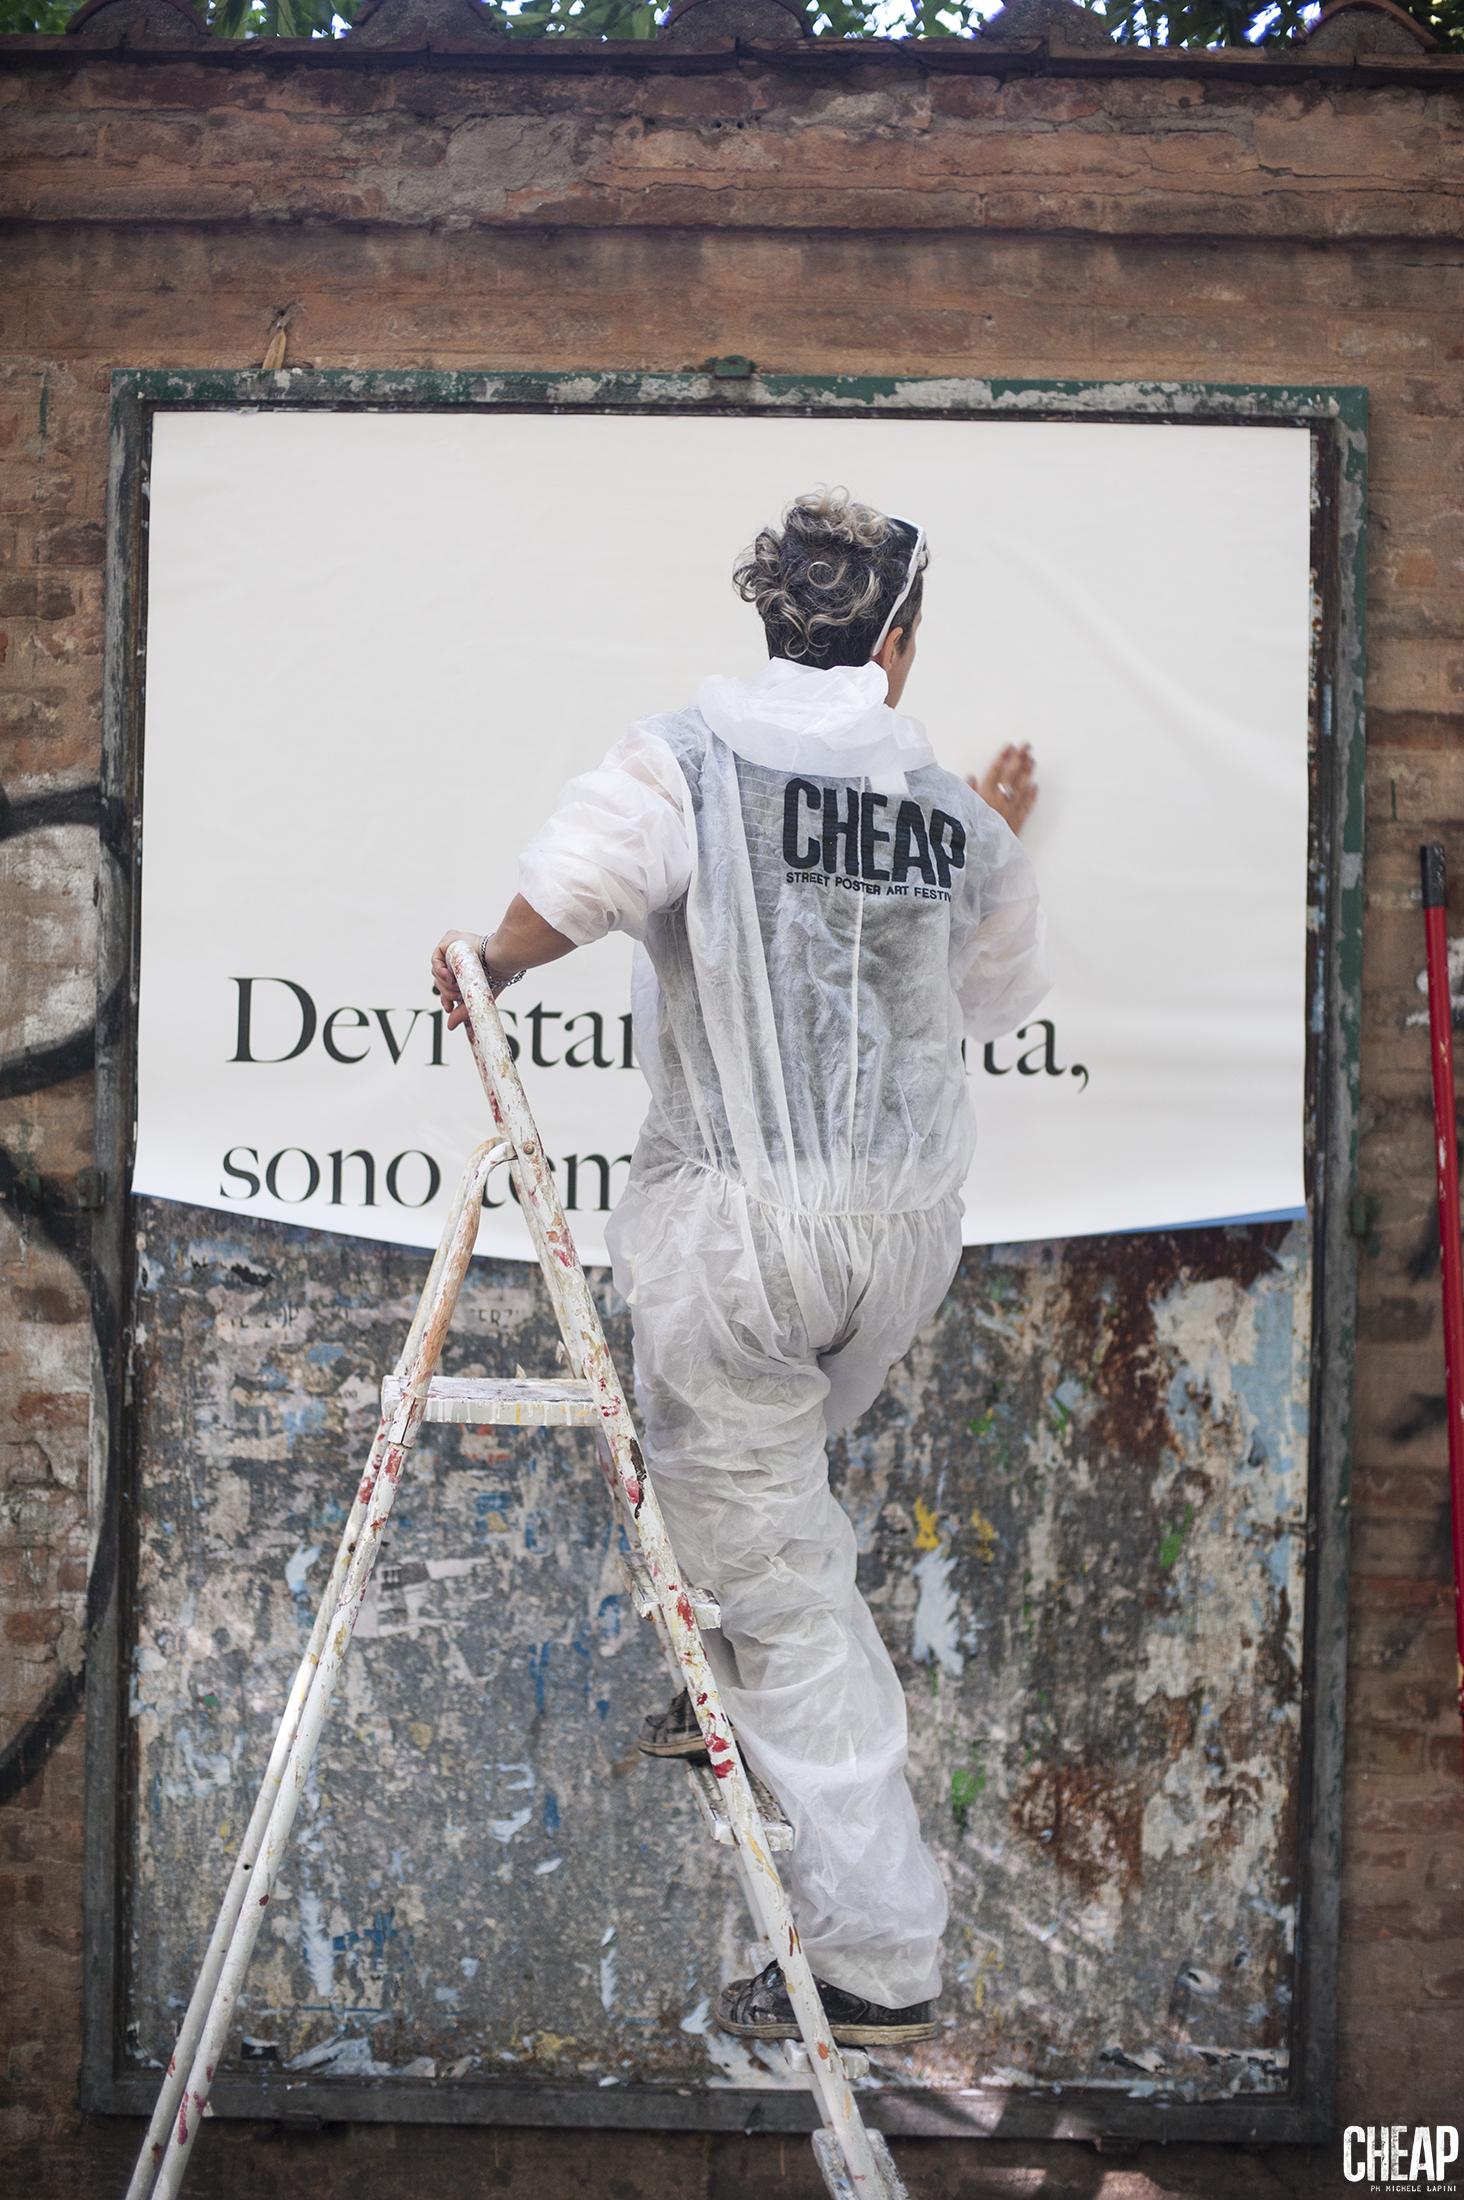 Cheap Festival Santarcangelo Festival Via Irnerio Bologna Poster